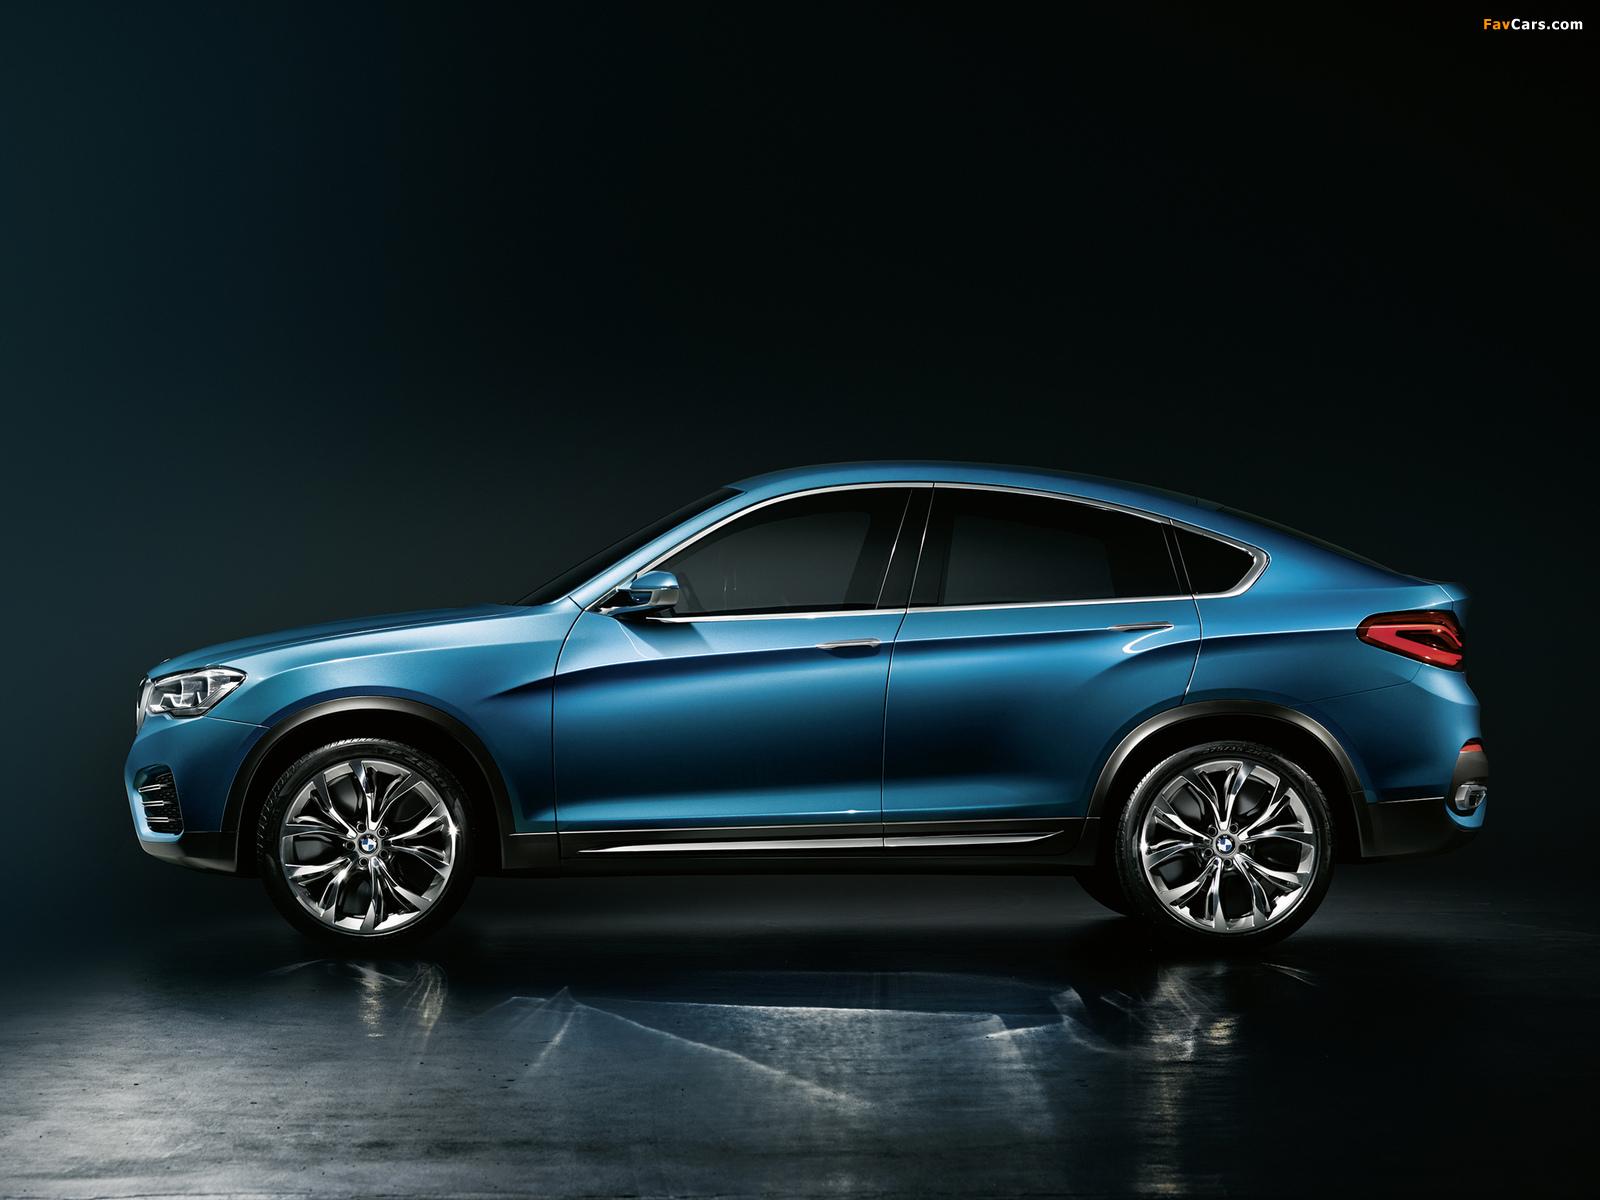 BMW Concept X4 (F26) 2013 photos (1600 x 1200)